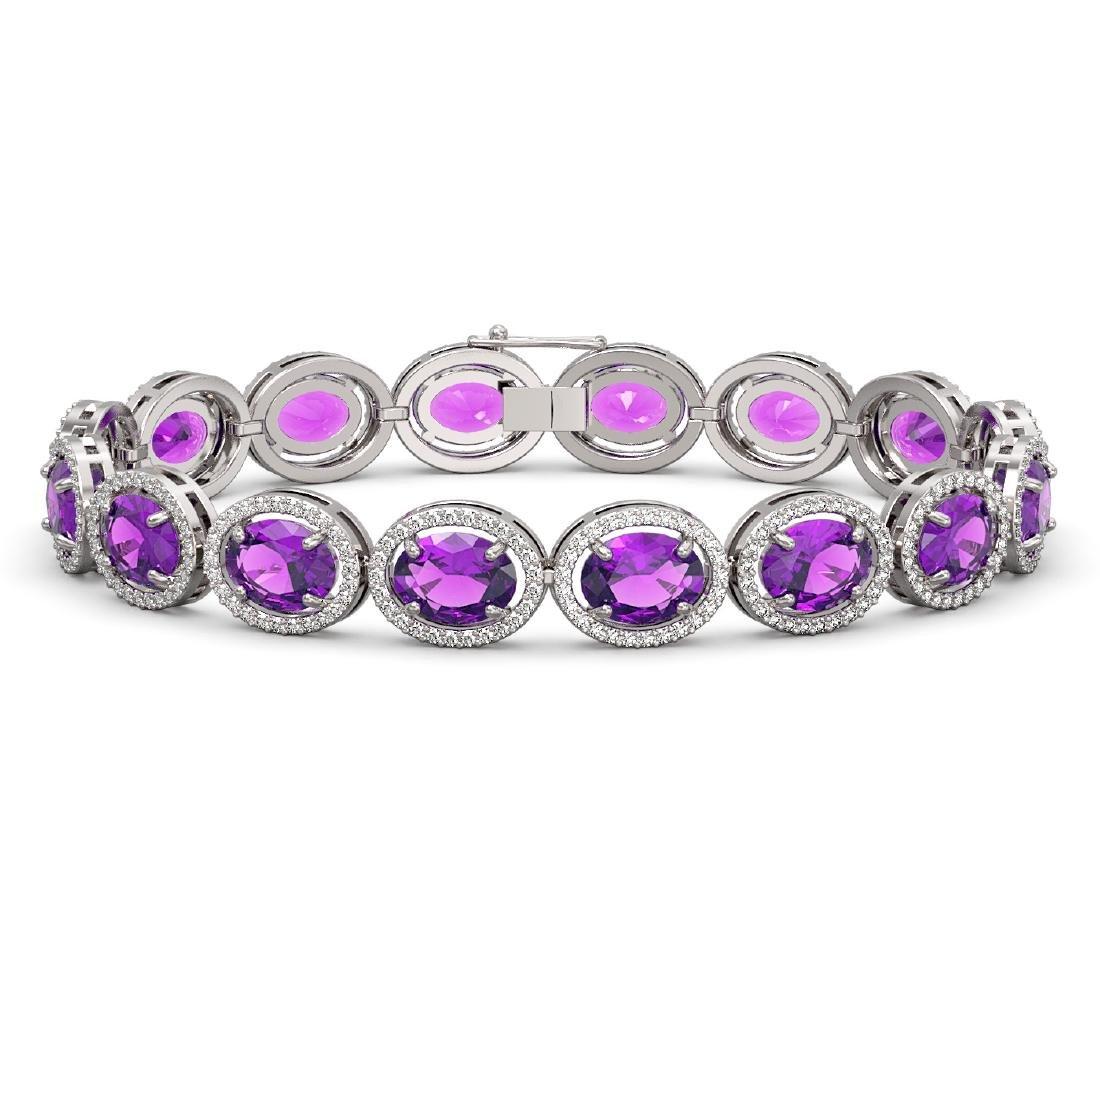 24.72 CTW Amethyst & Diamond Halo Bracelet 10K White